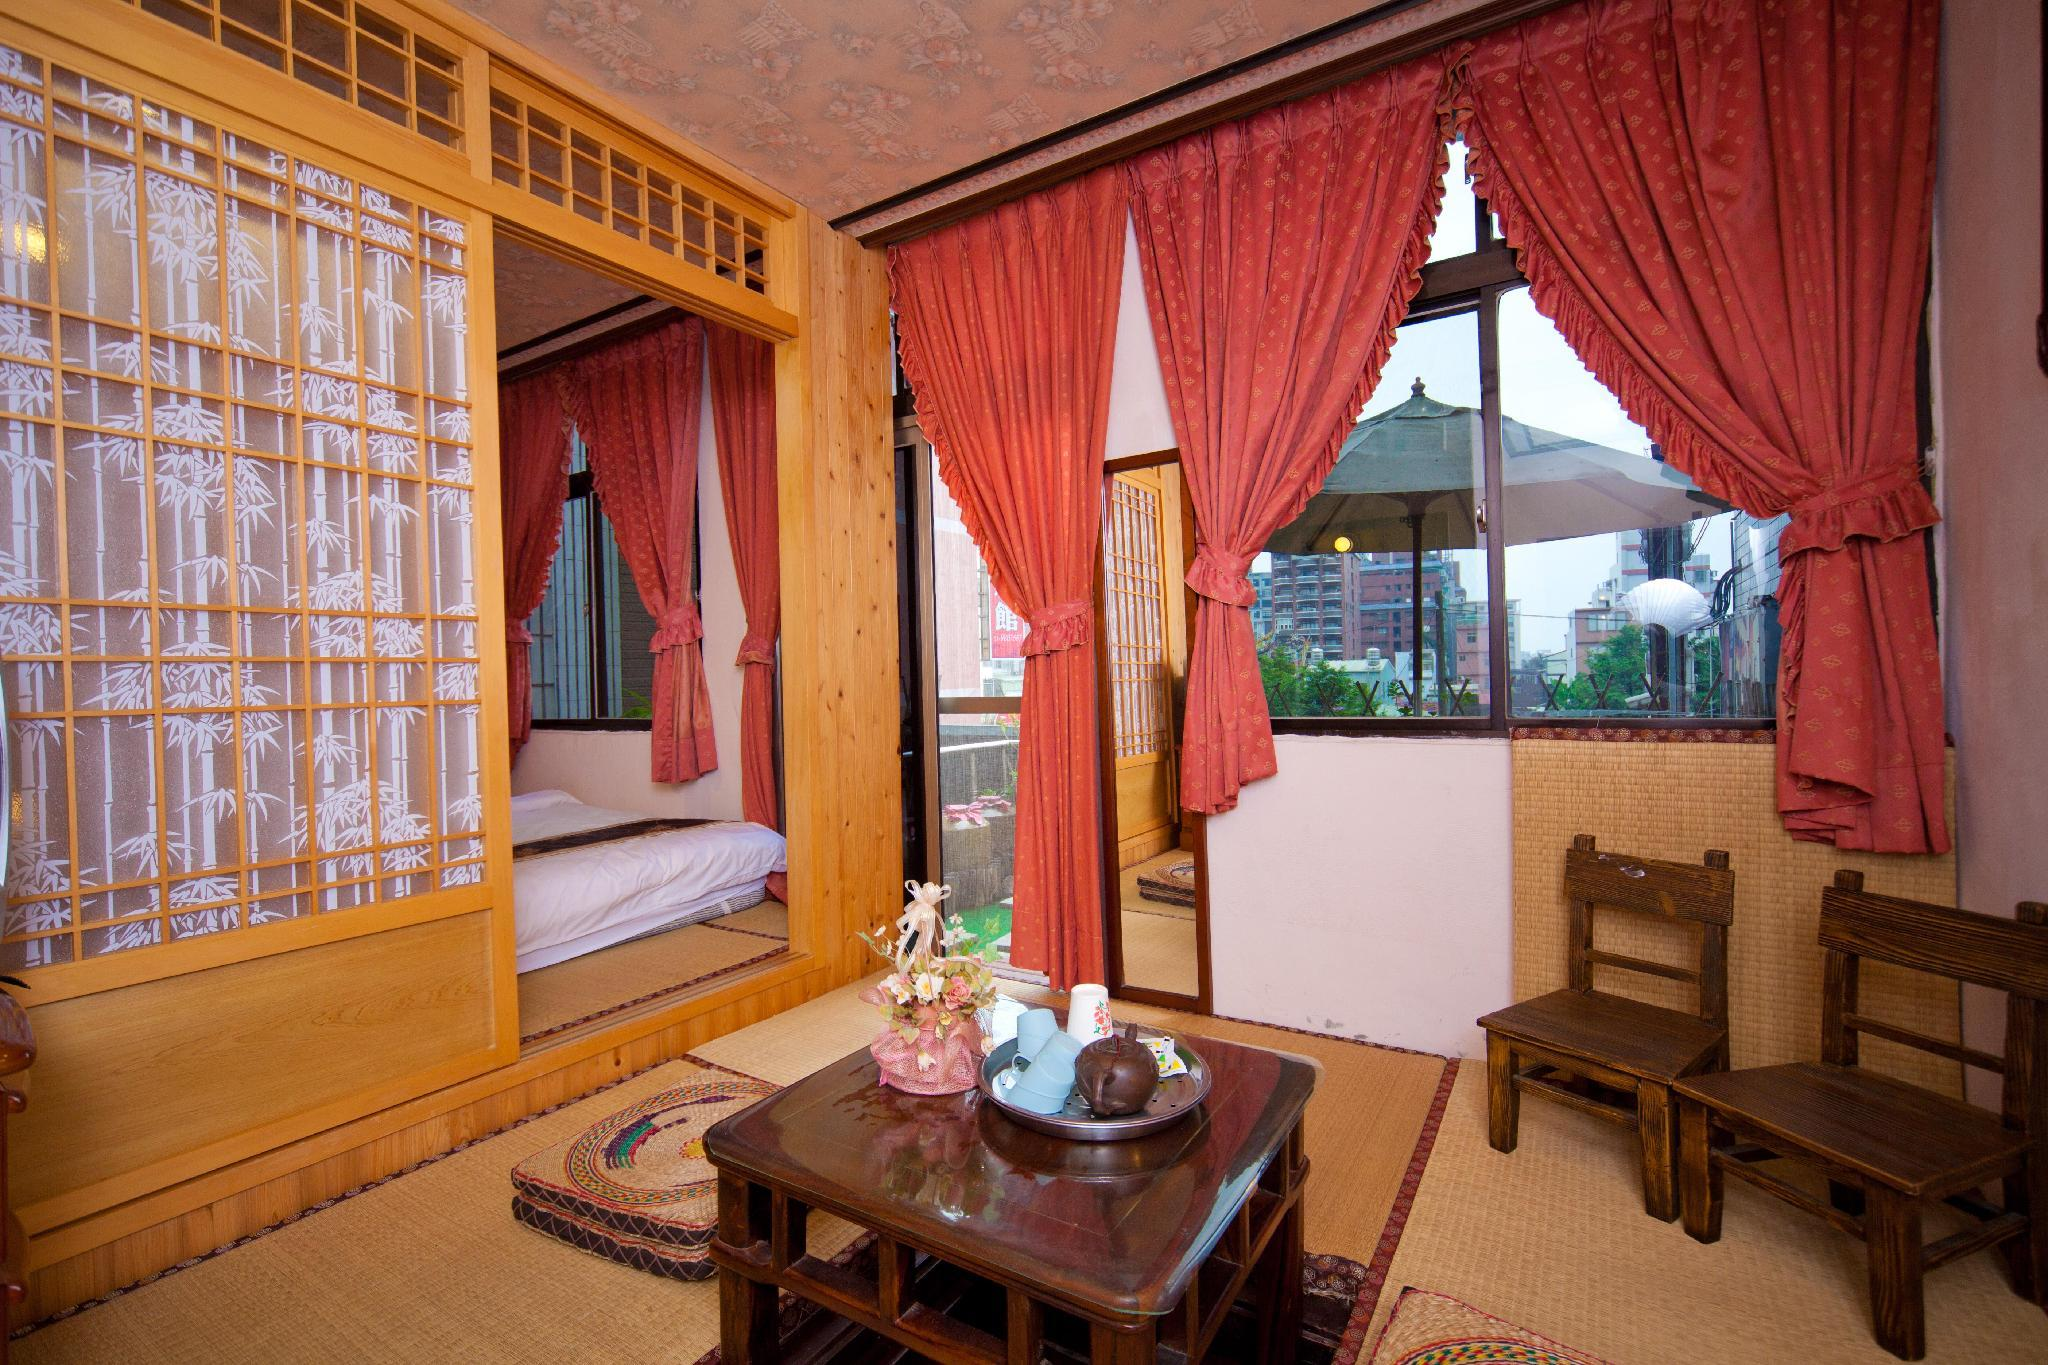 Ming Ren Hotspring Hotel